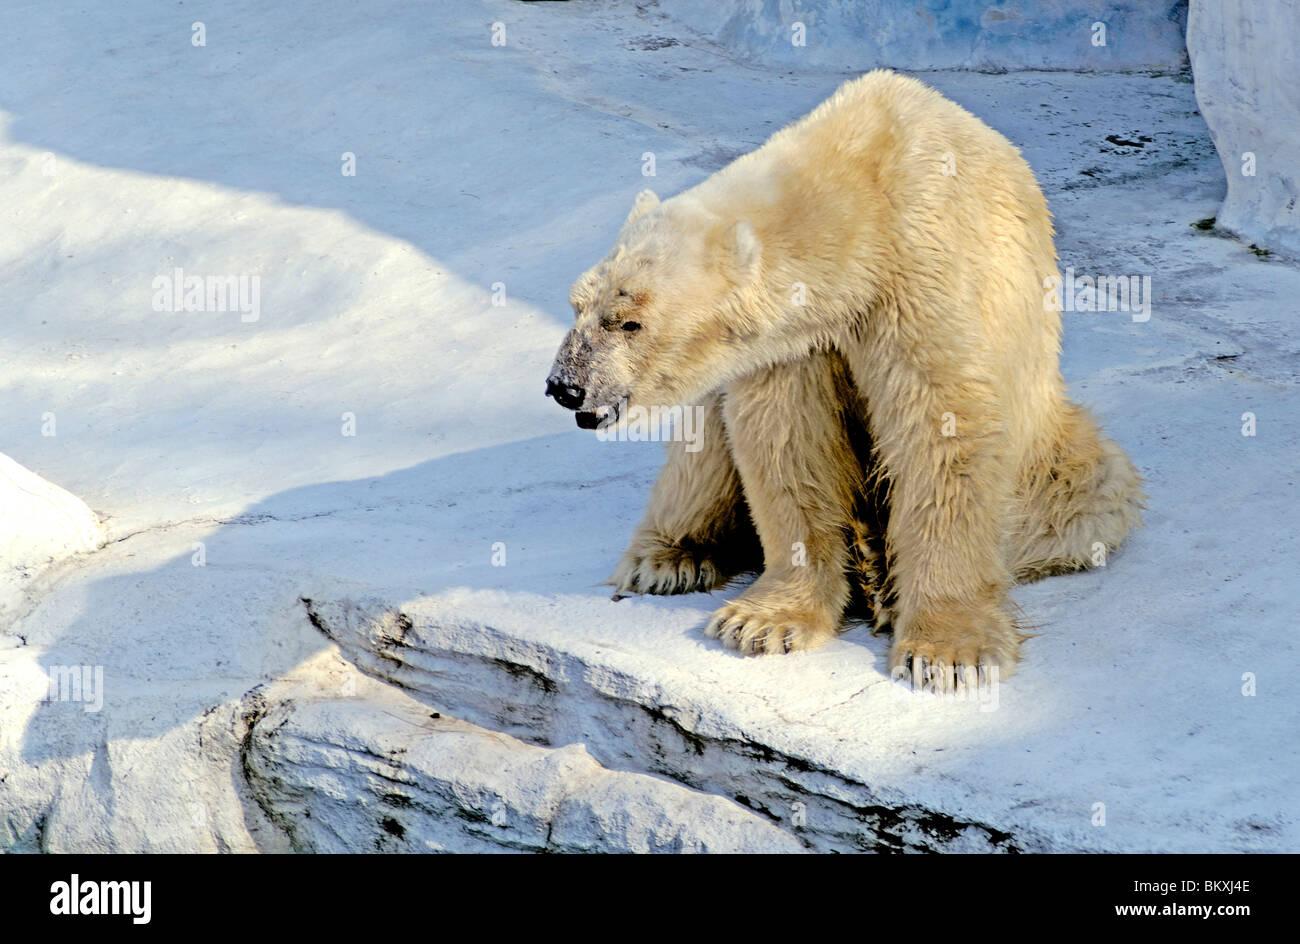 One Polar Bear Safari world Bangkok ; Thailand ; South East Asia - Stock Image